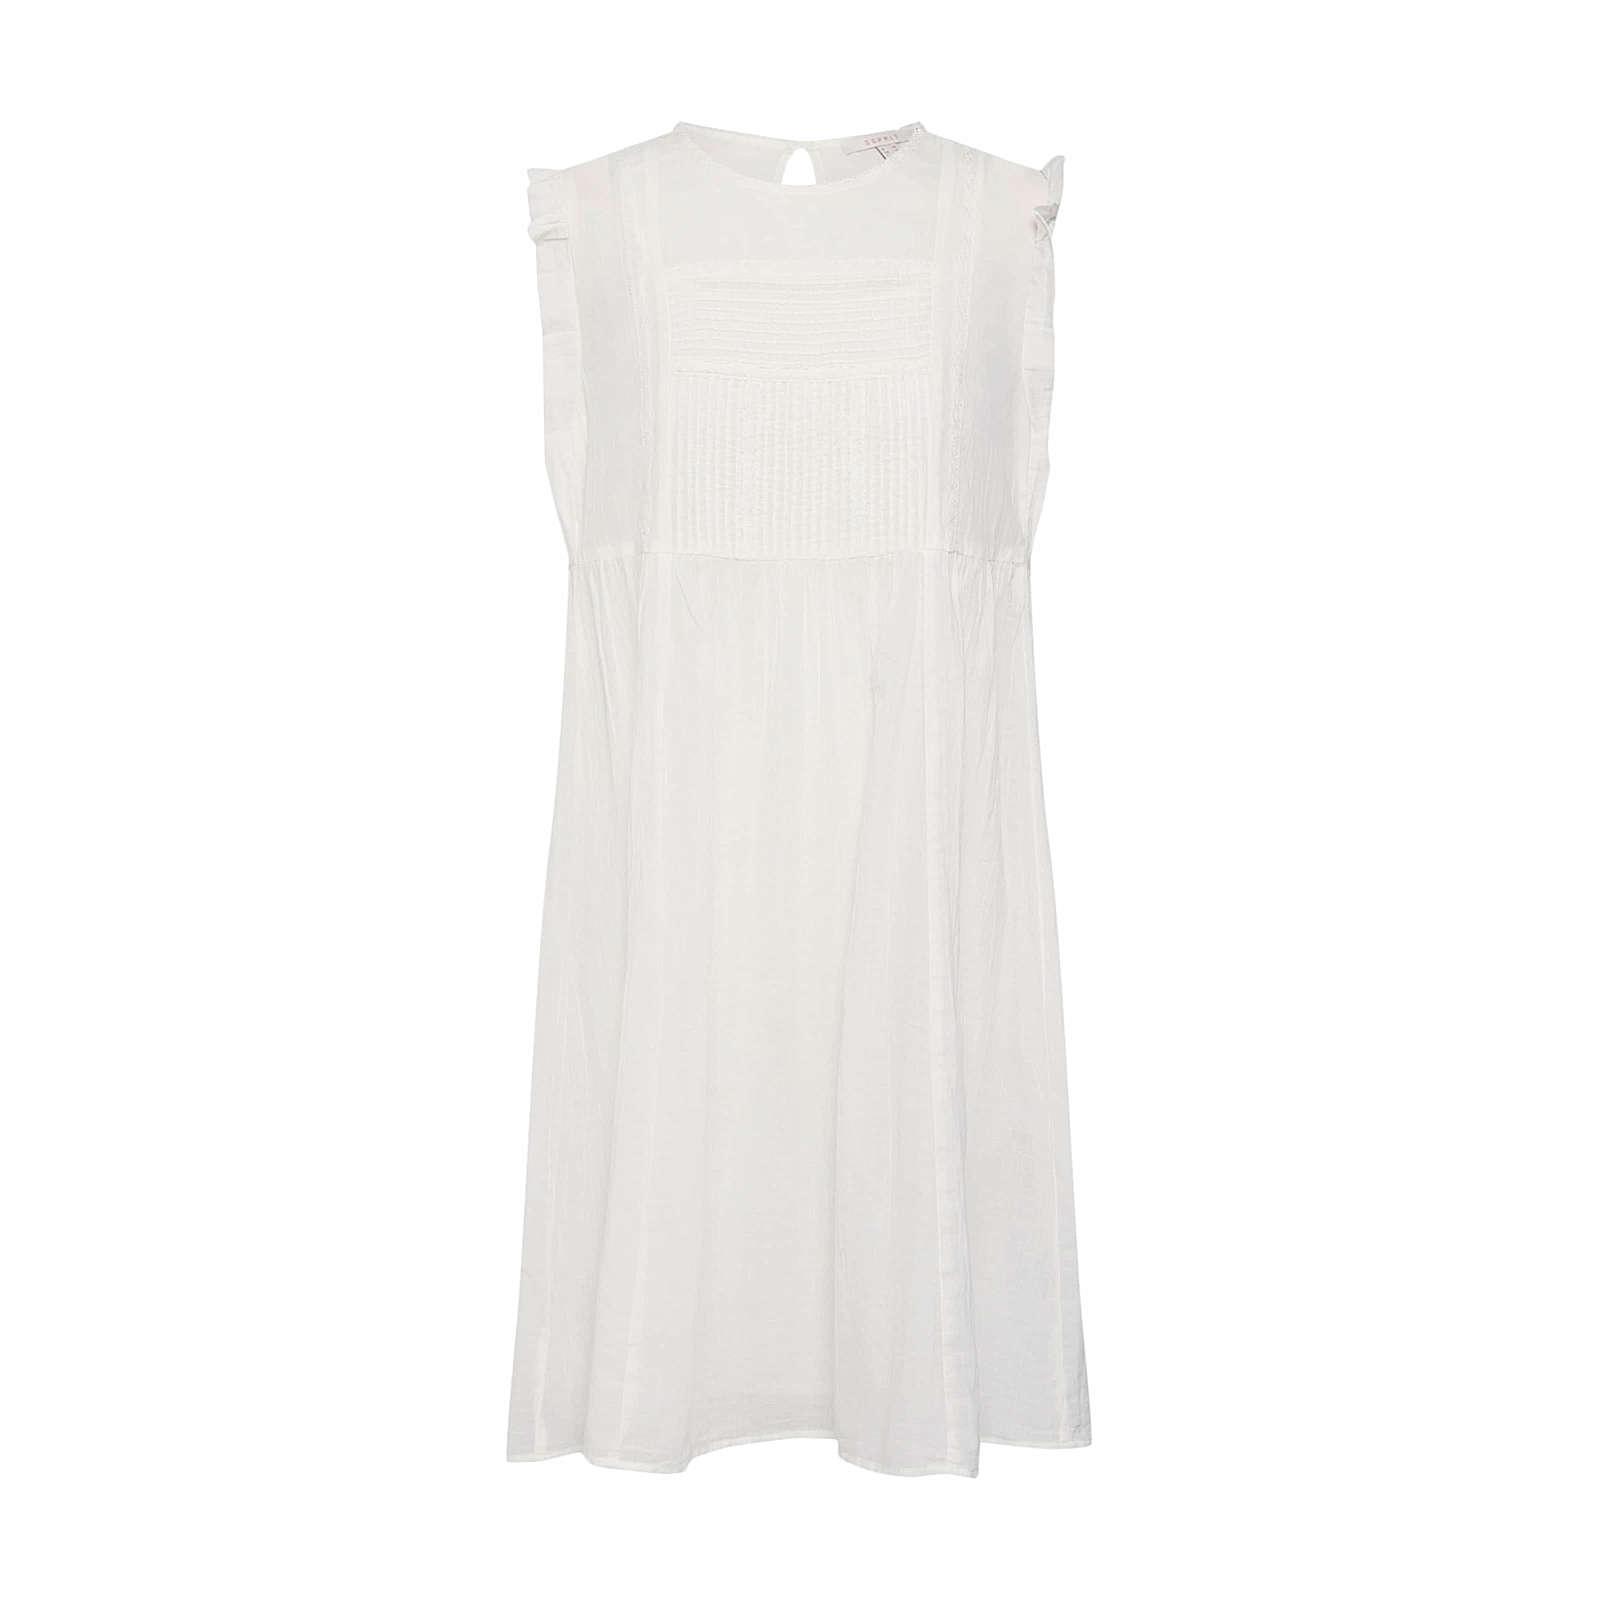 ESPRIT Sommerkleid Sommerkleider offwhite Damen Gr. 42